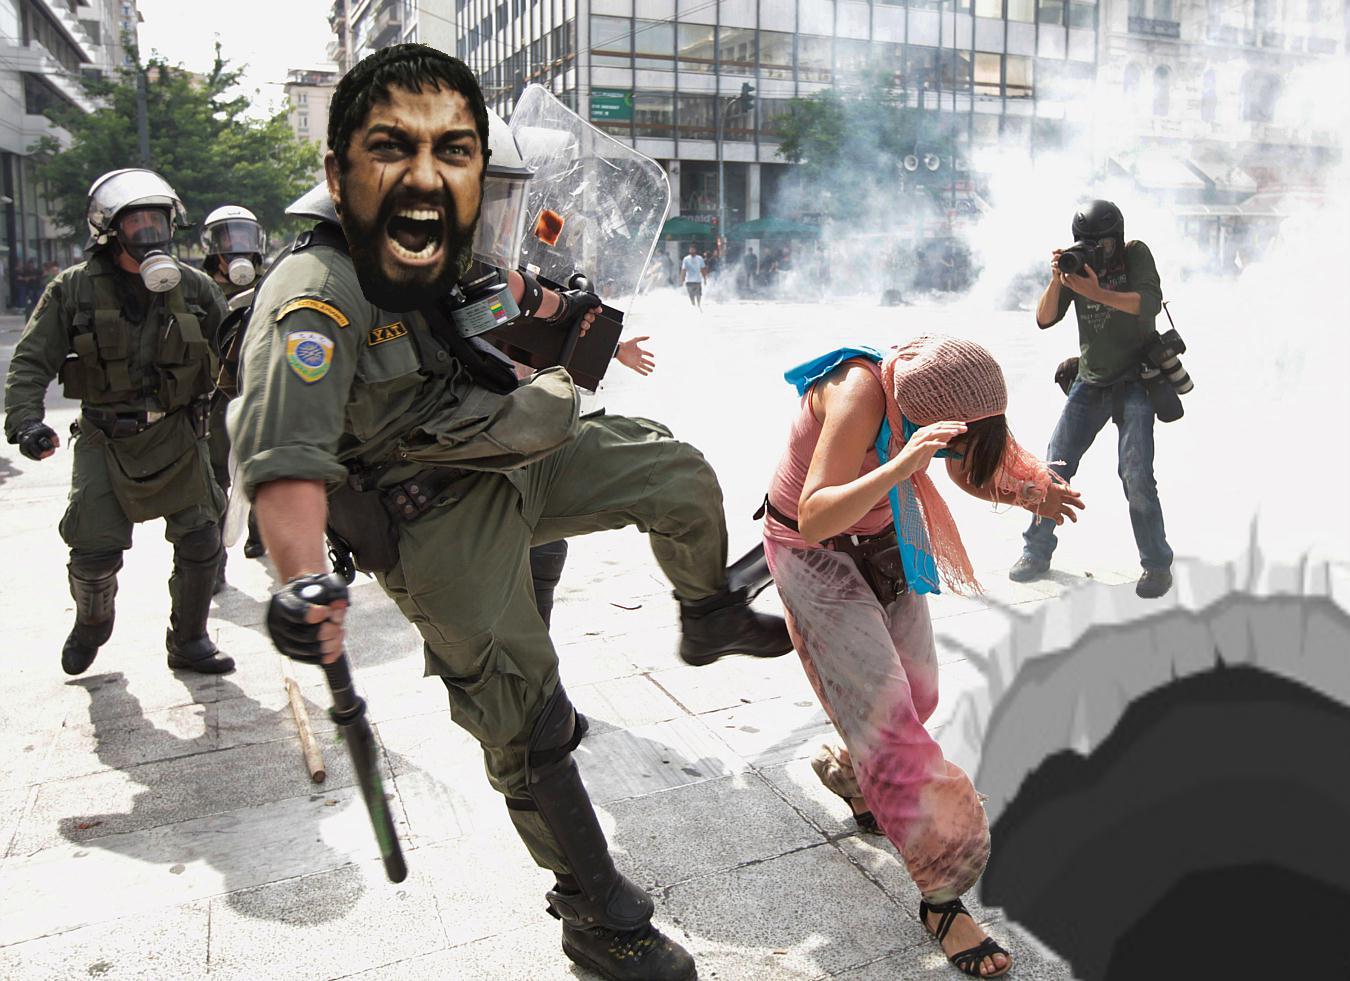 The Ukrainian Sparta Kick